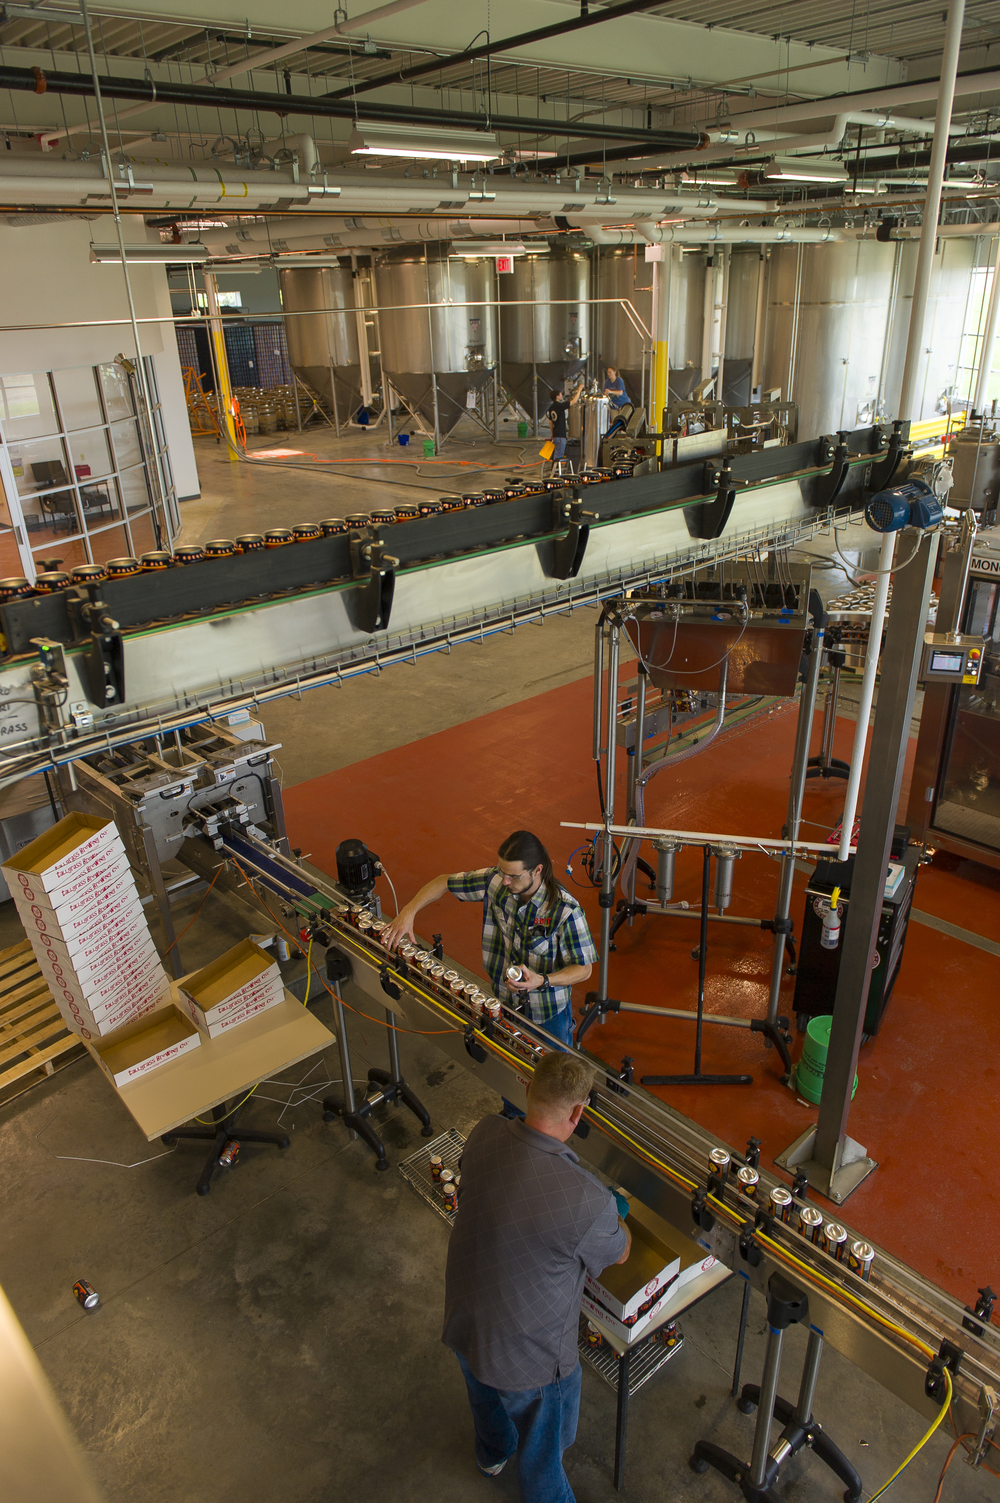 20150505_tallgrass_brewery_0130.jpg